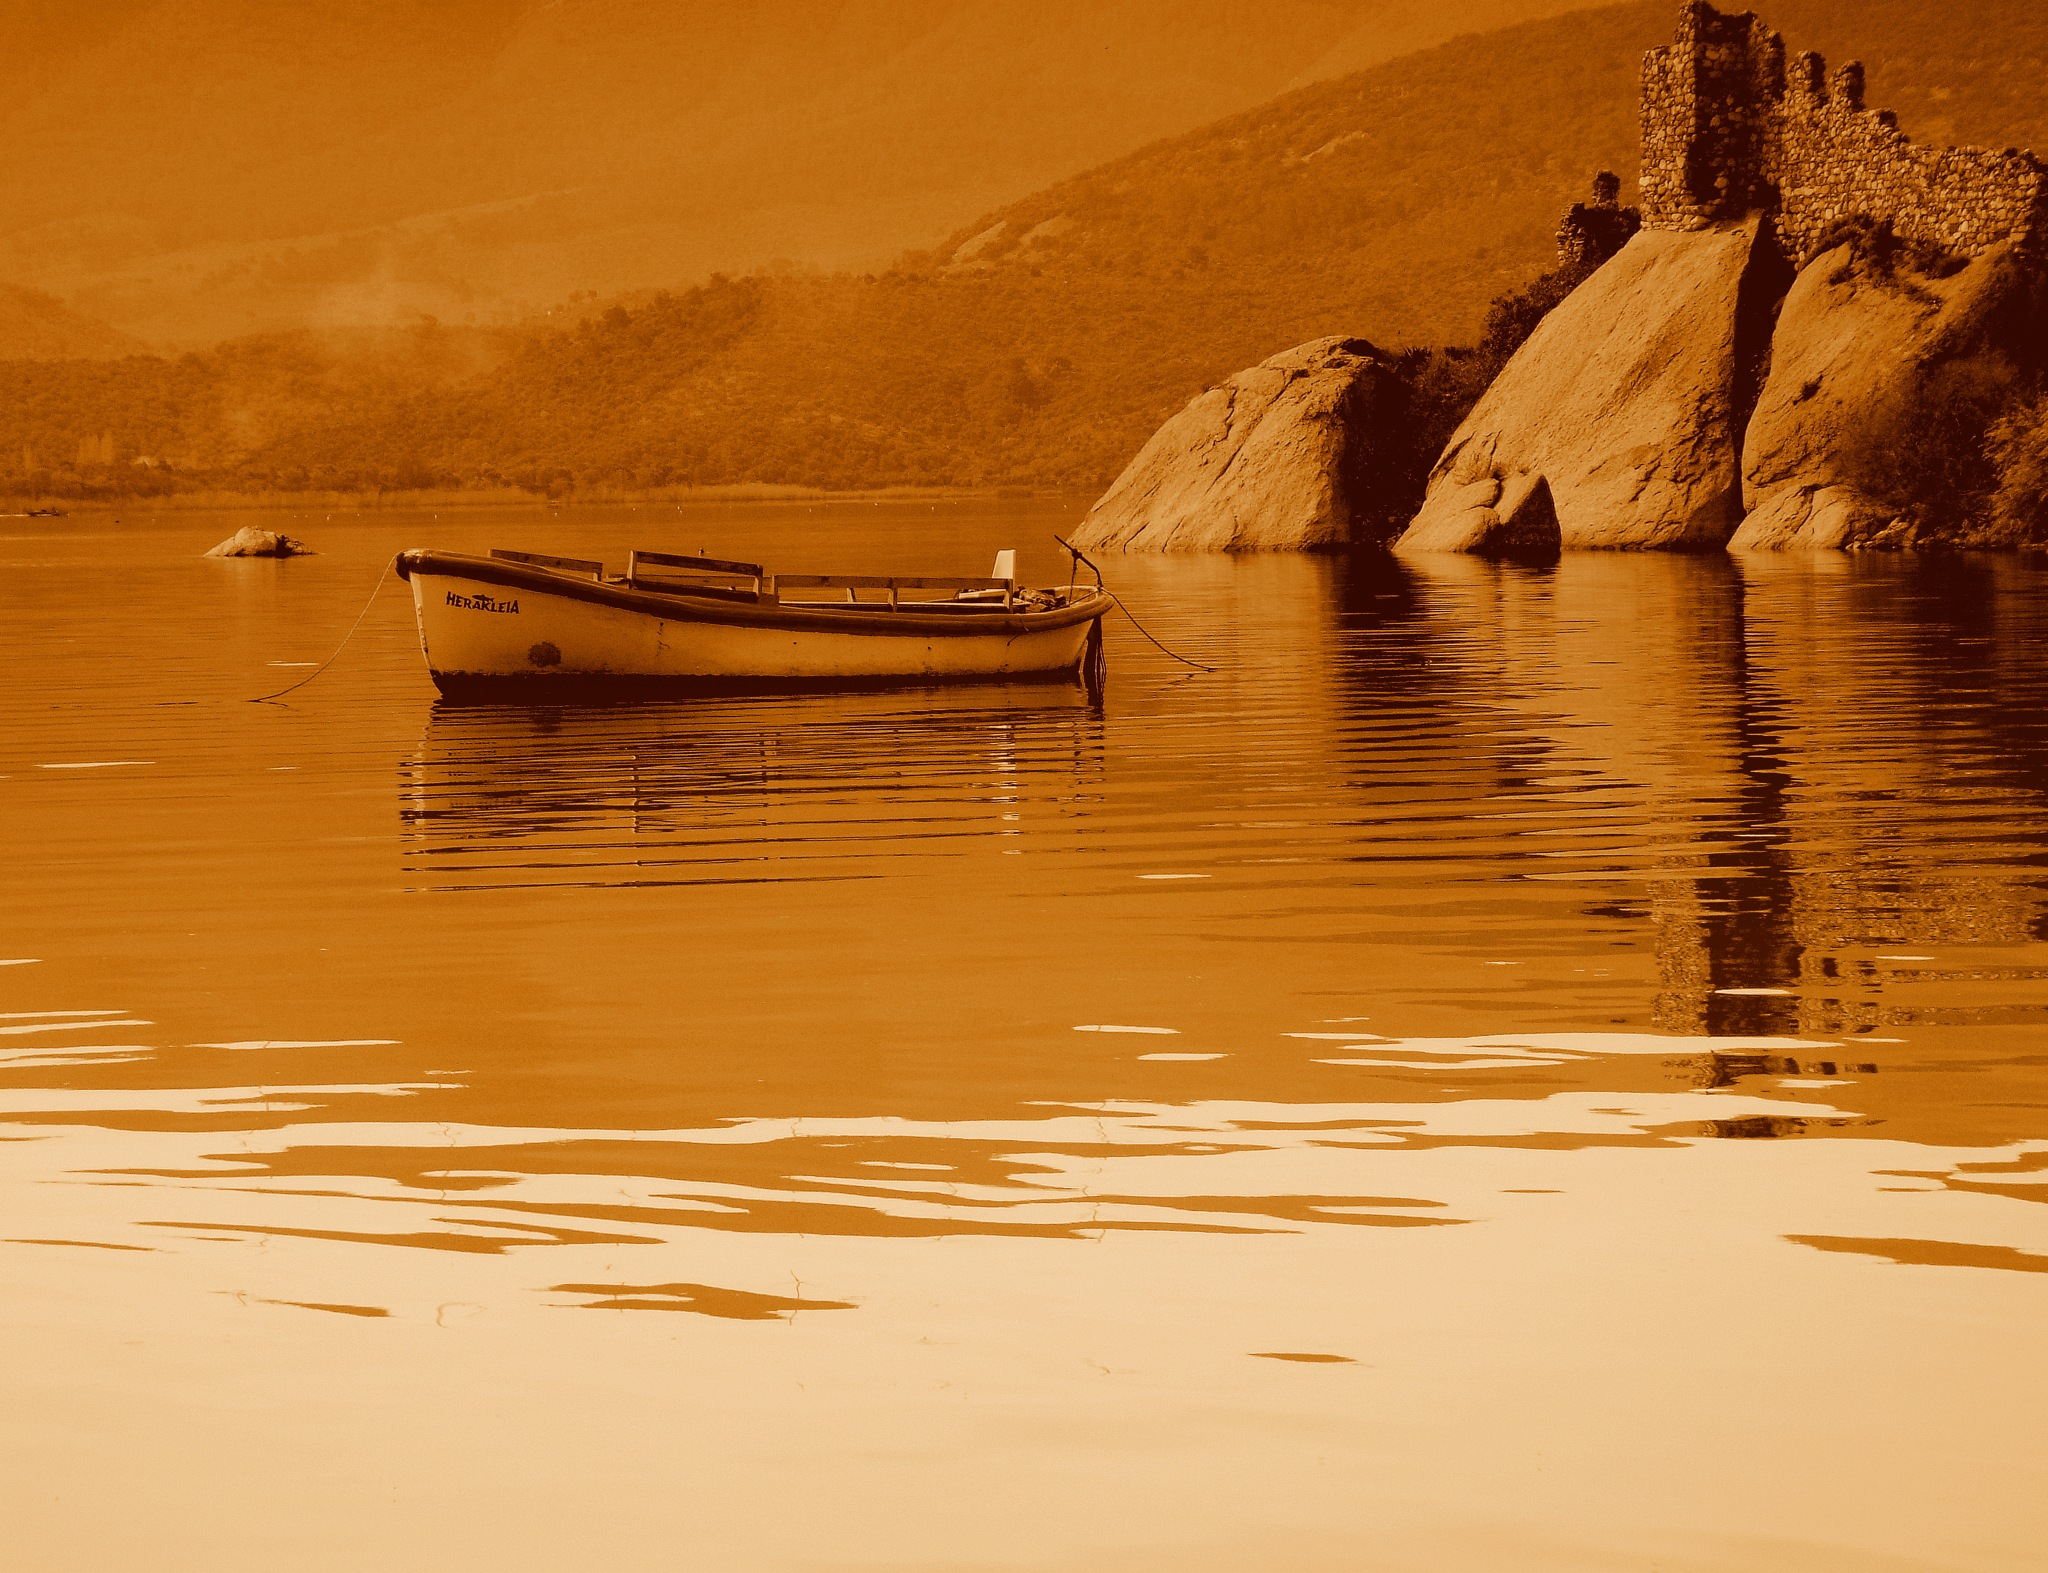 BAFA LAKE HERAKLEIA, SEPIA by Akin Saner